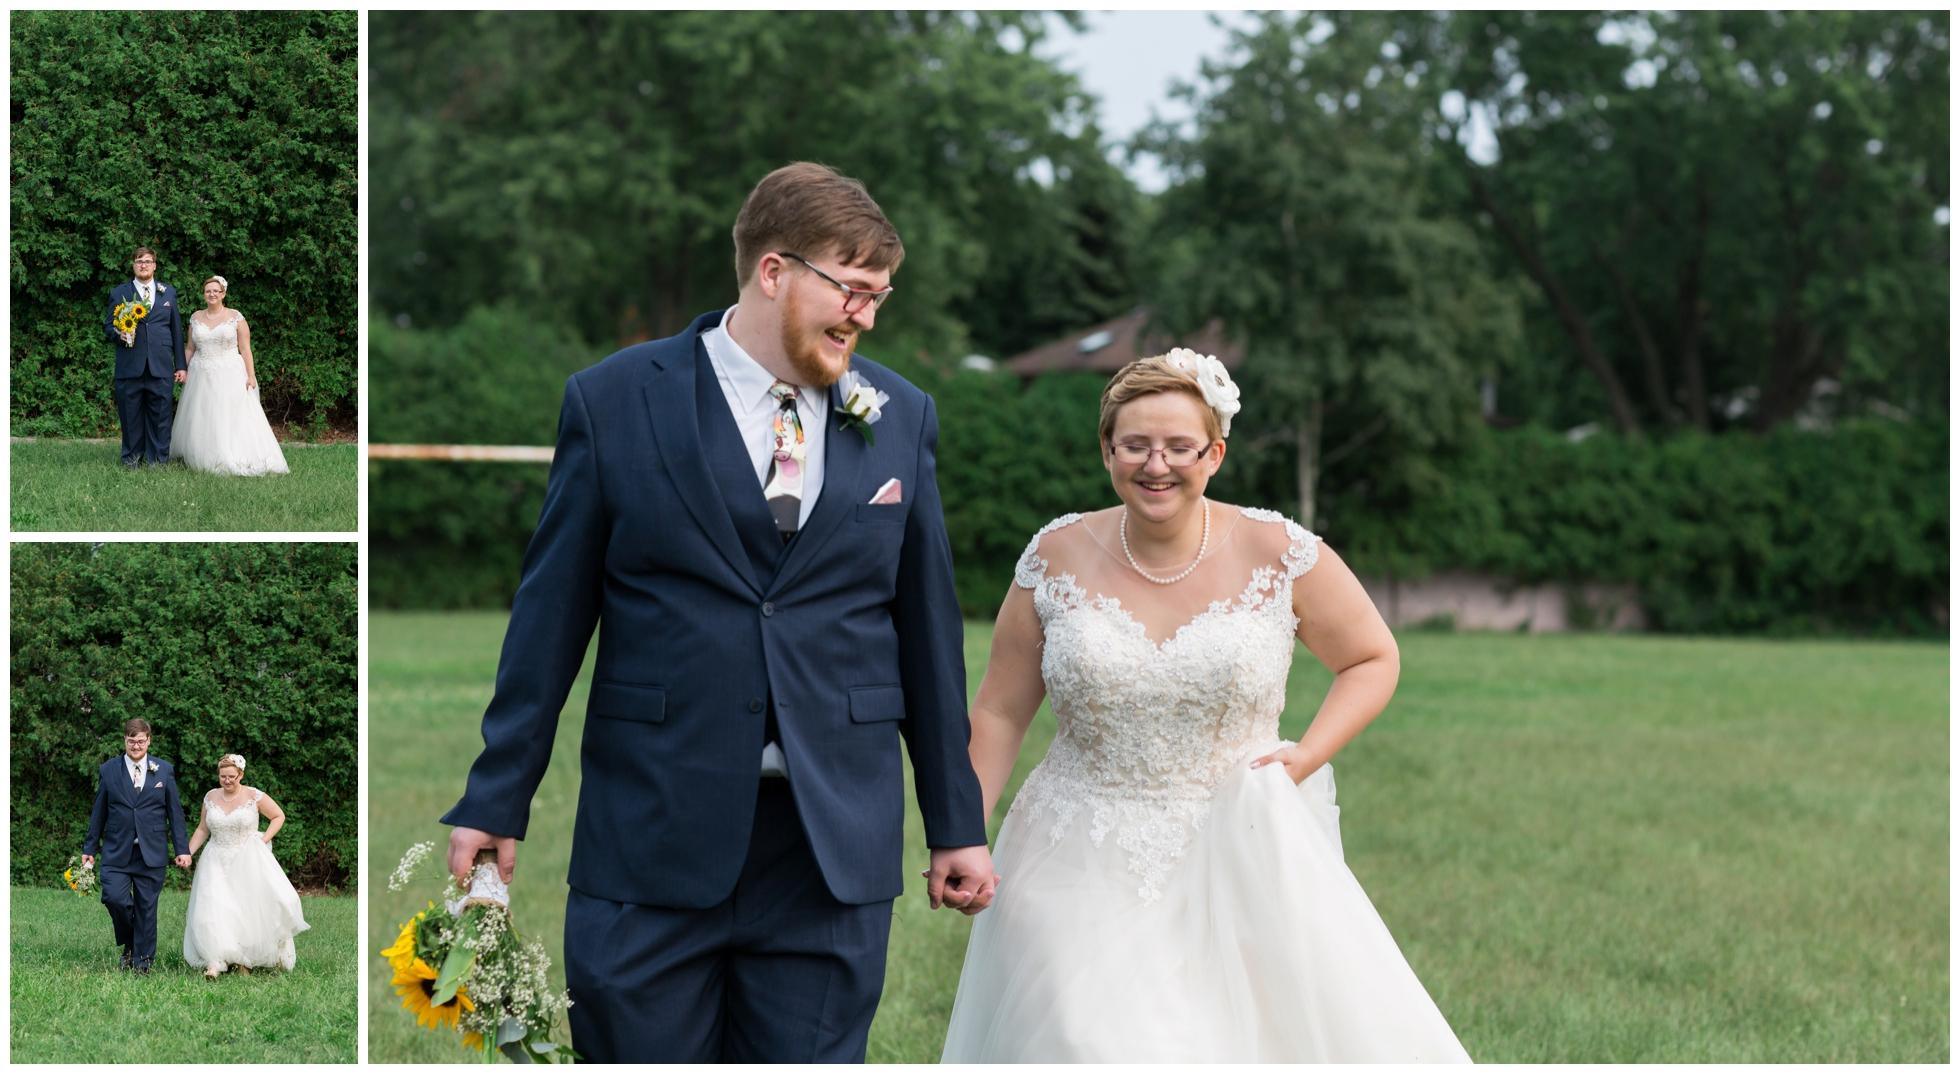 Toronto Wedding Chris Kate (Selena Phillips-Boyle)_0027.jpg